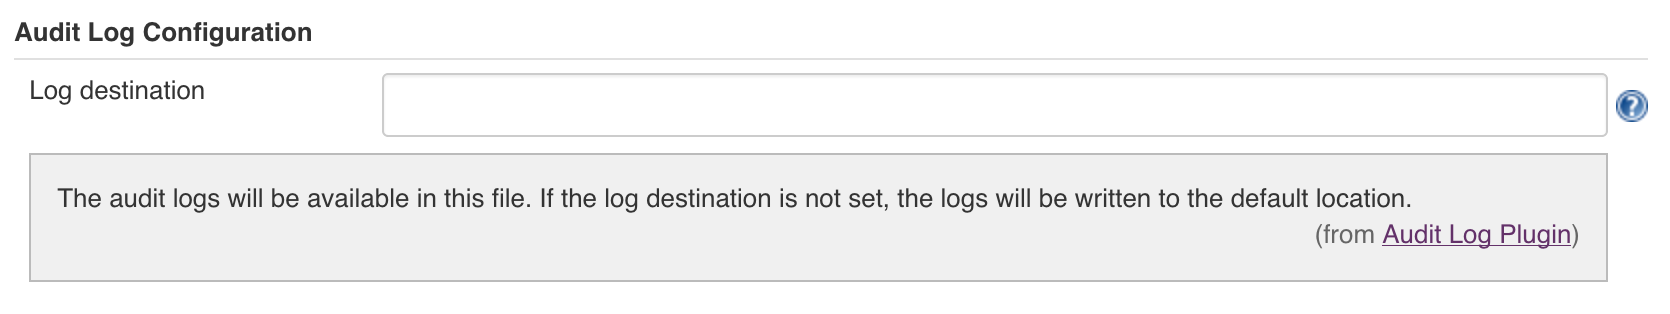 Audit log configuration UI